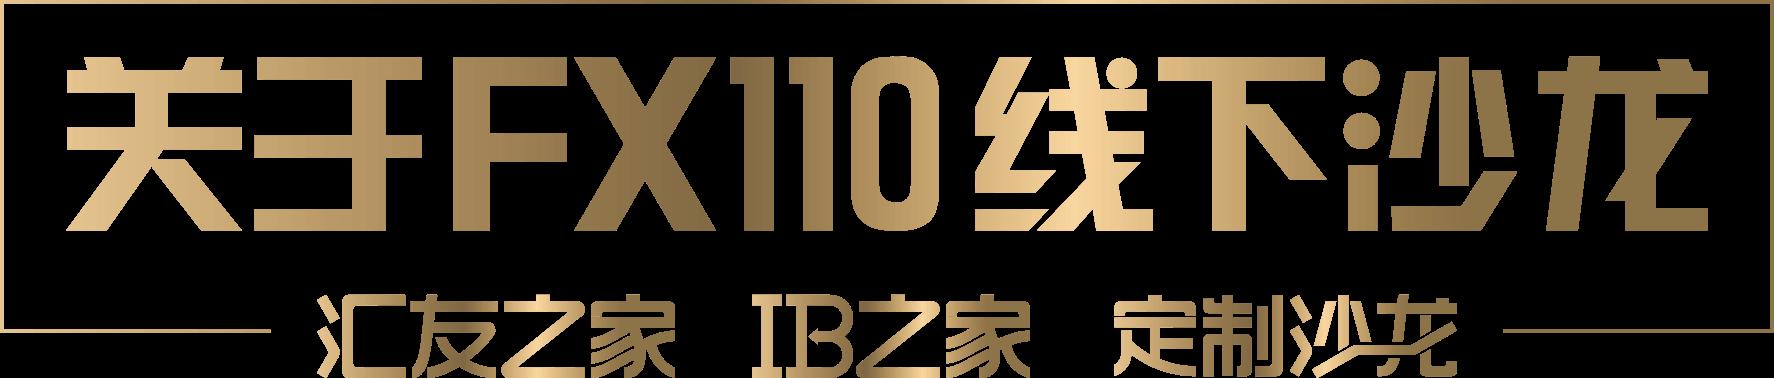 FX110線下活動